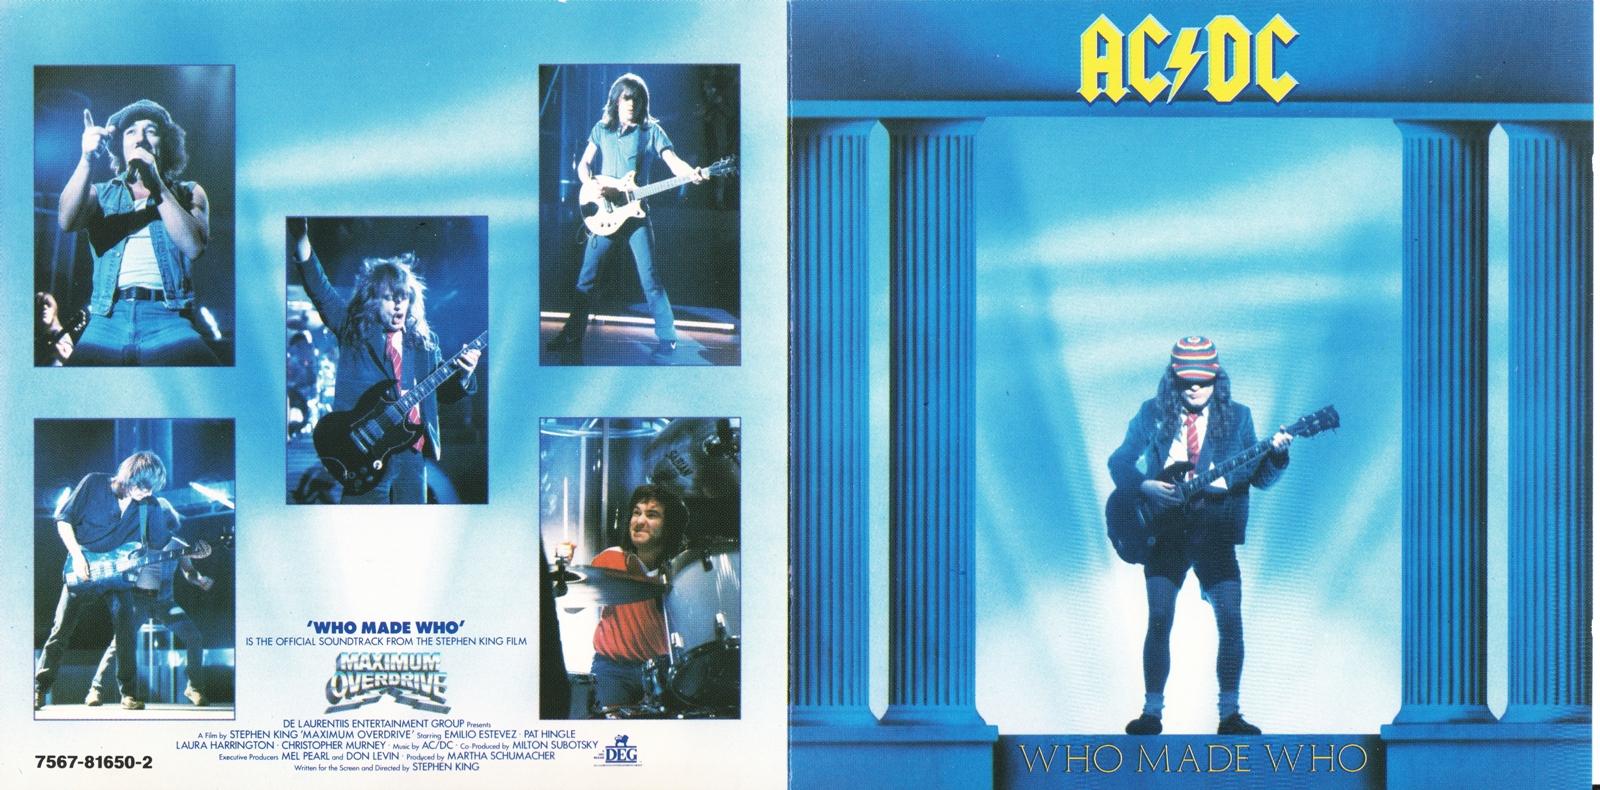 http://vitcoff.narod.ru/music/rock/foto/ACDC-Who_Made_Who_Soundtrack_1986.jpg